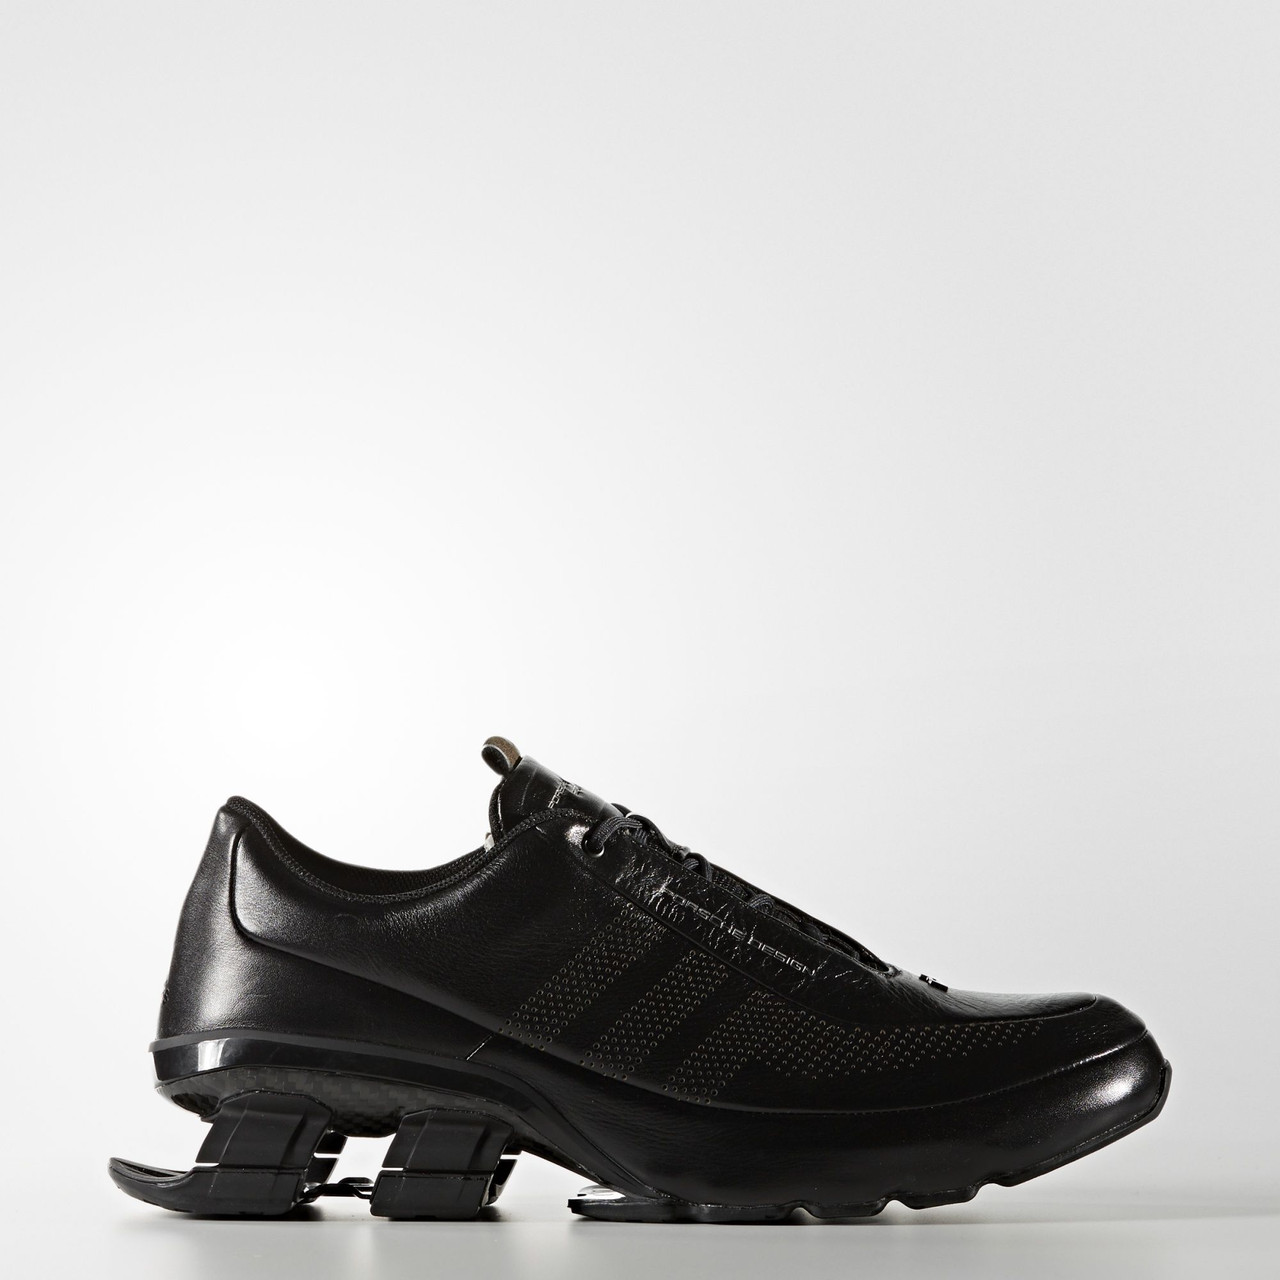 960f46ac Мужские кроссовки Adidas Porsche Design Bounce: S4 Leather (Артикул:  BB5524) - Интернет